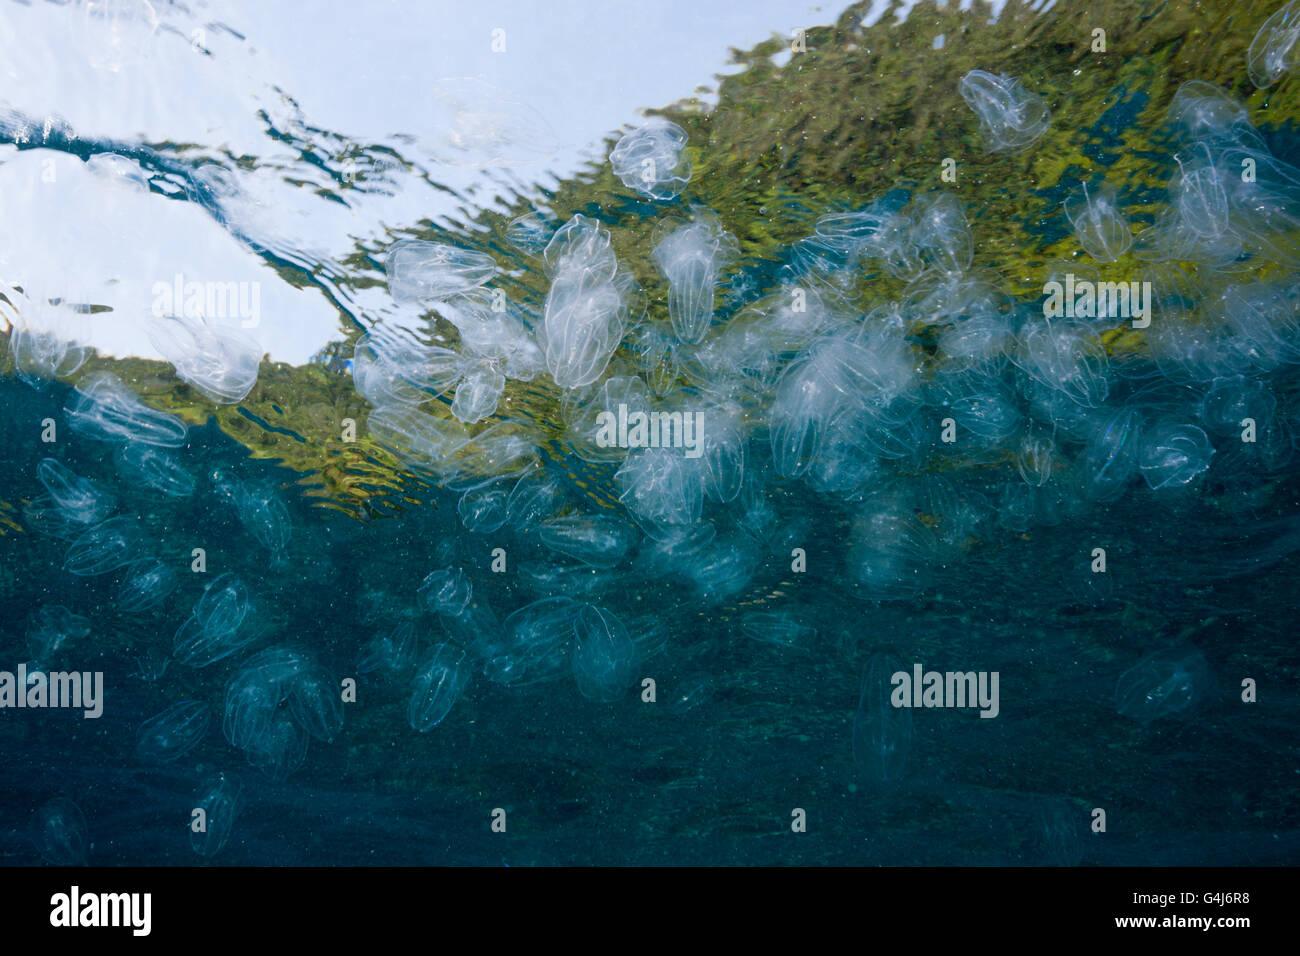 Aggregation der Mond Qualle, Aurelia Golden, Raja Ampat, West Papua, Indonesien Stockfoto